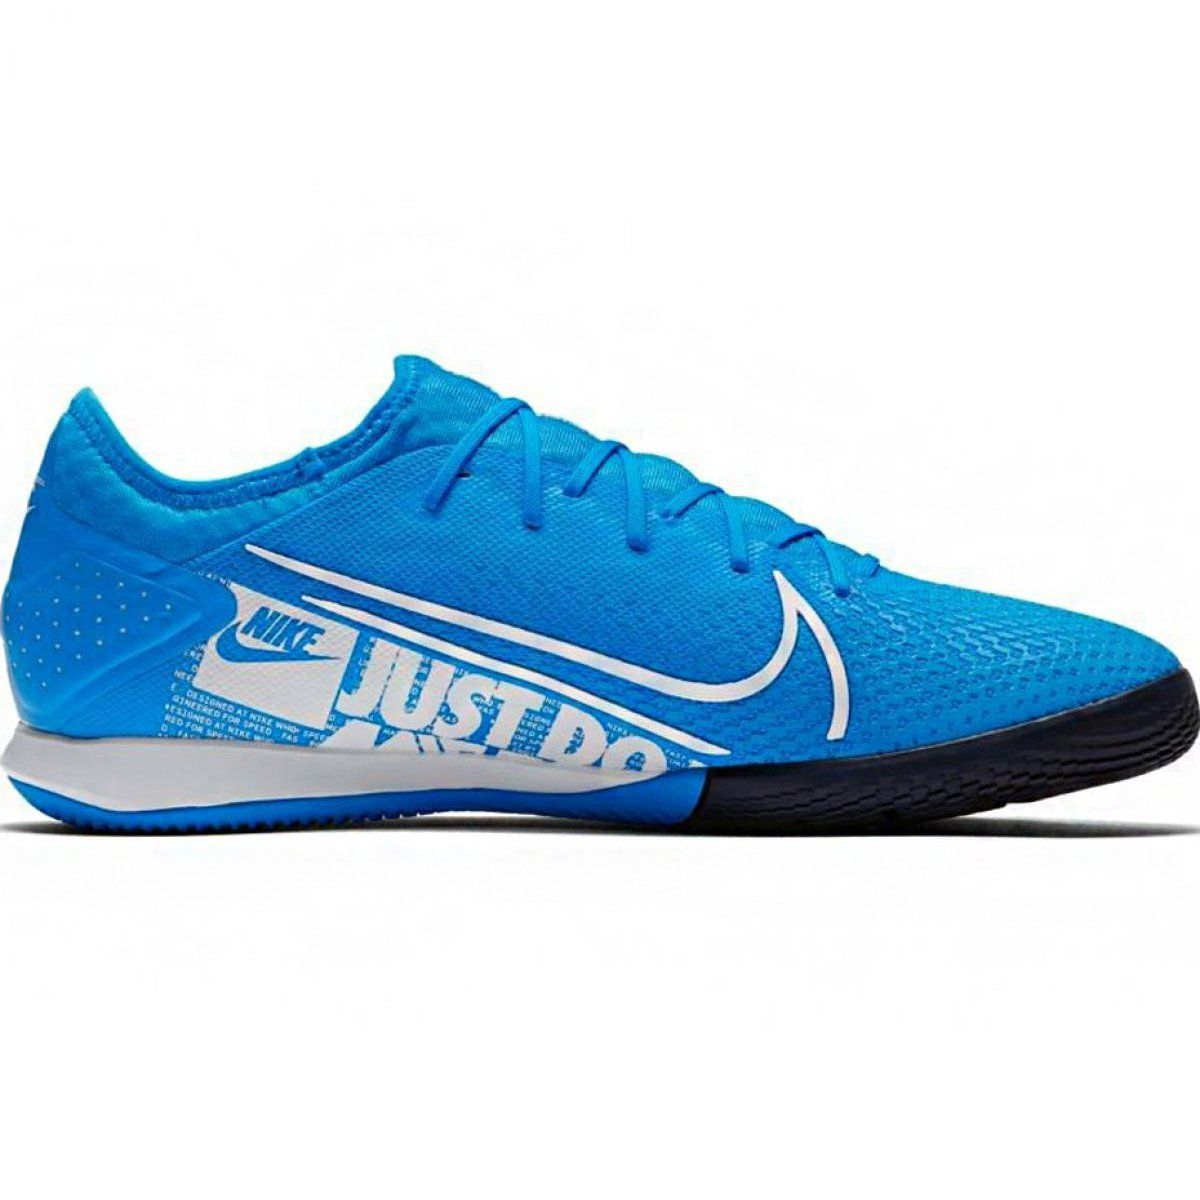 Chuteira Nike Mercurial Pro IC Futsal | Loja do Inter